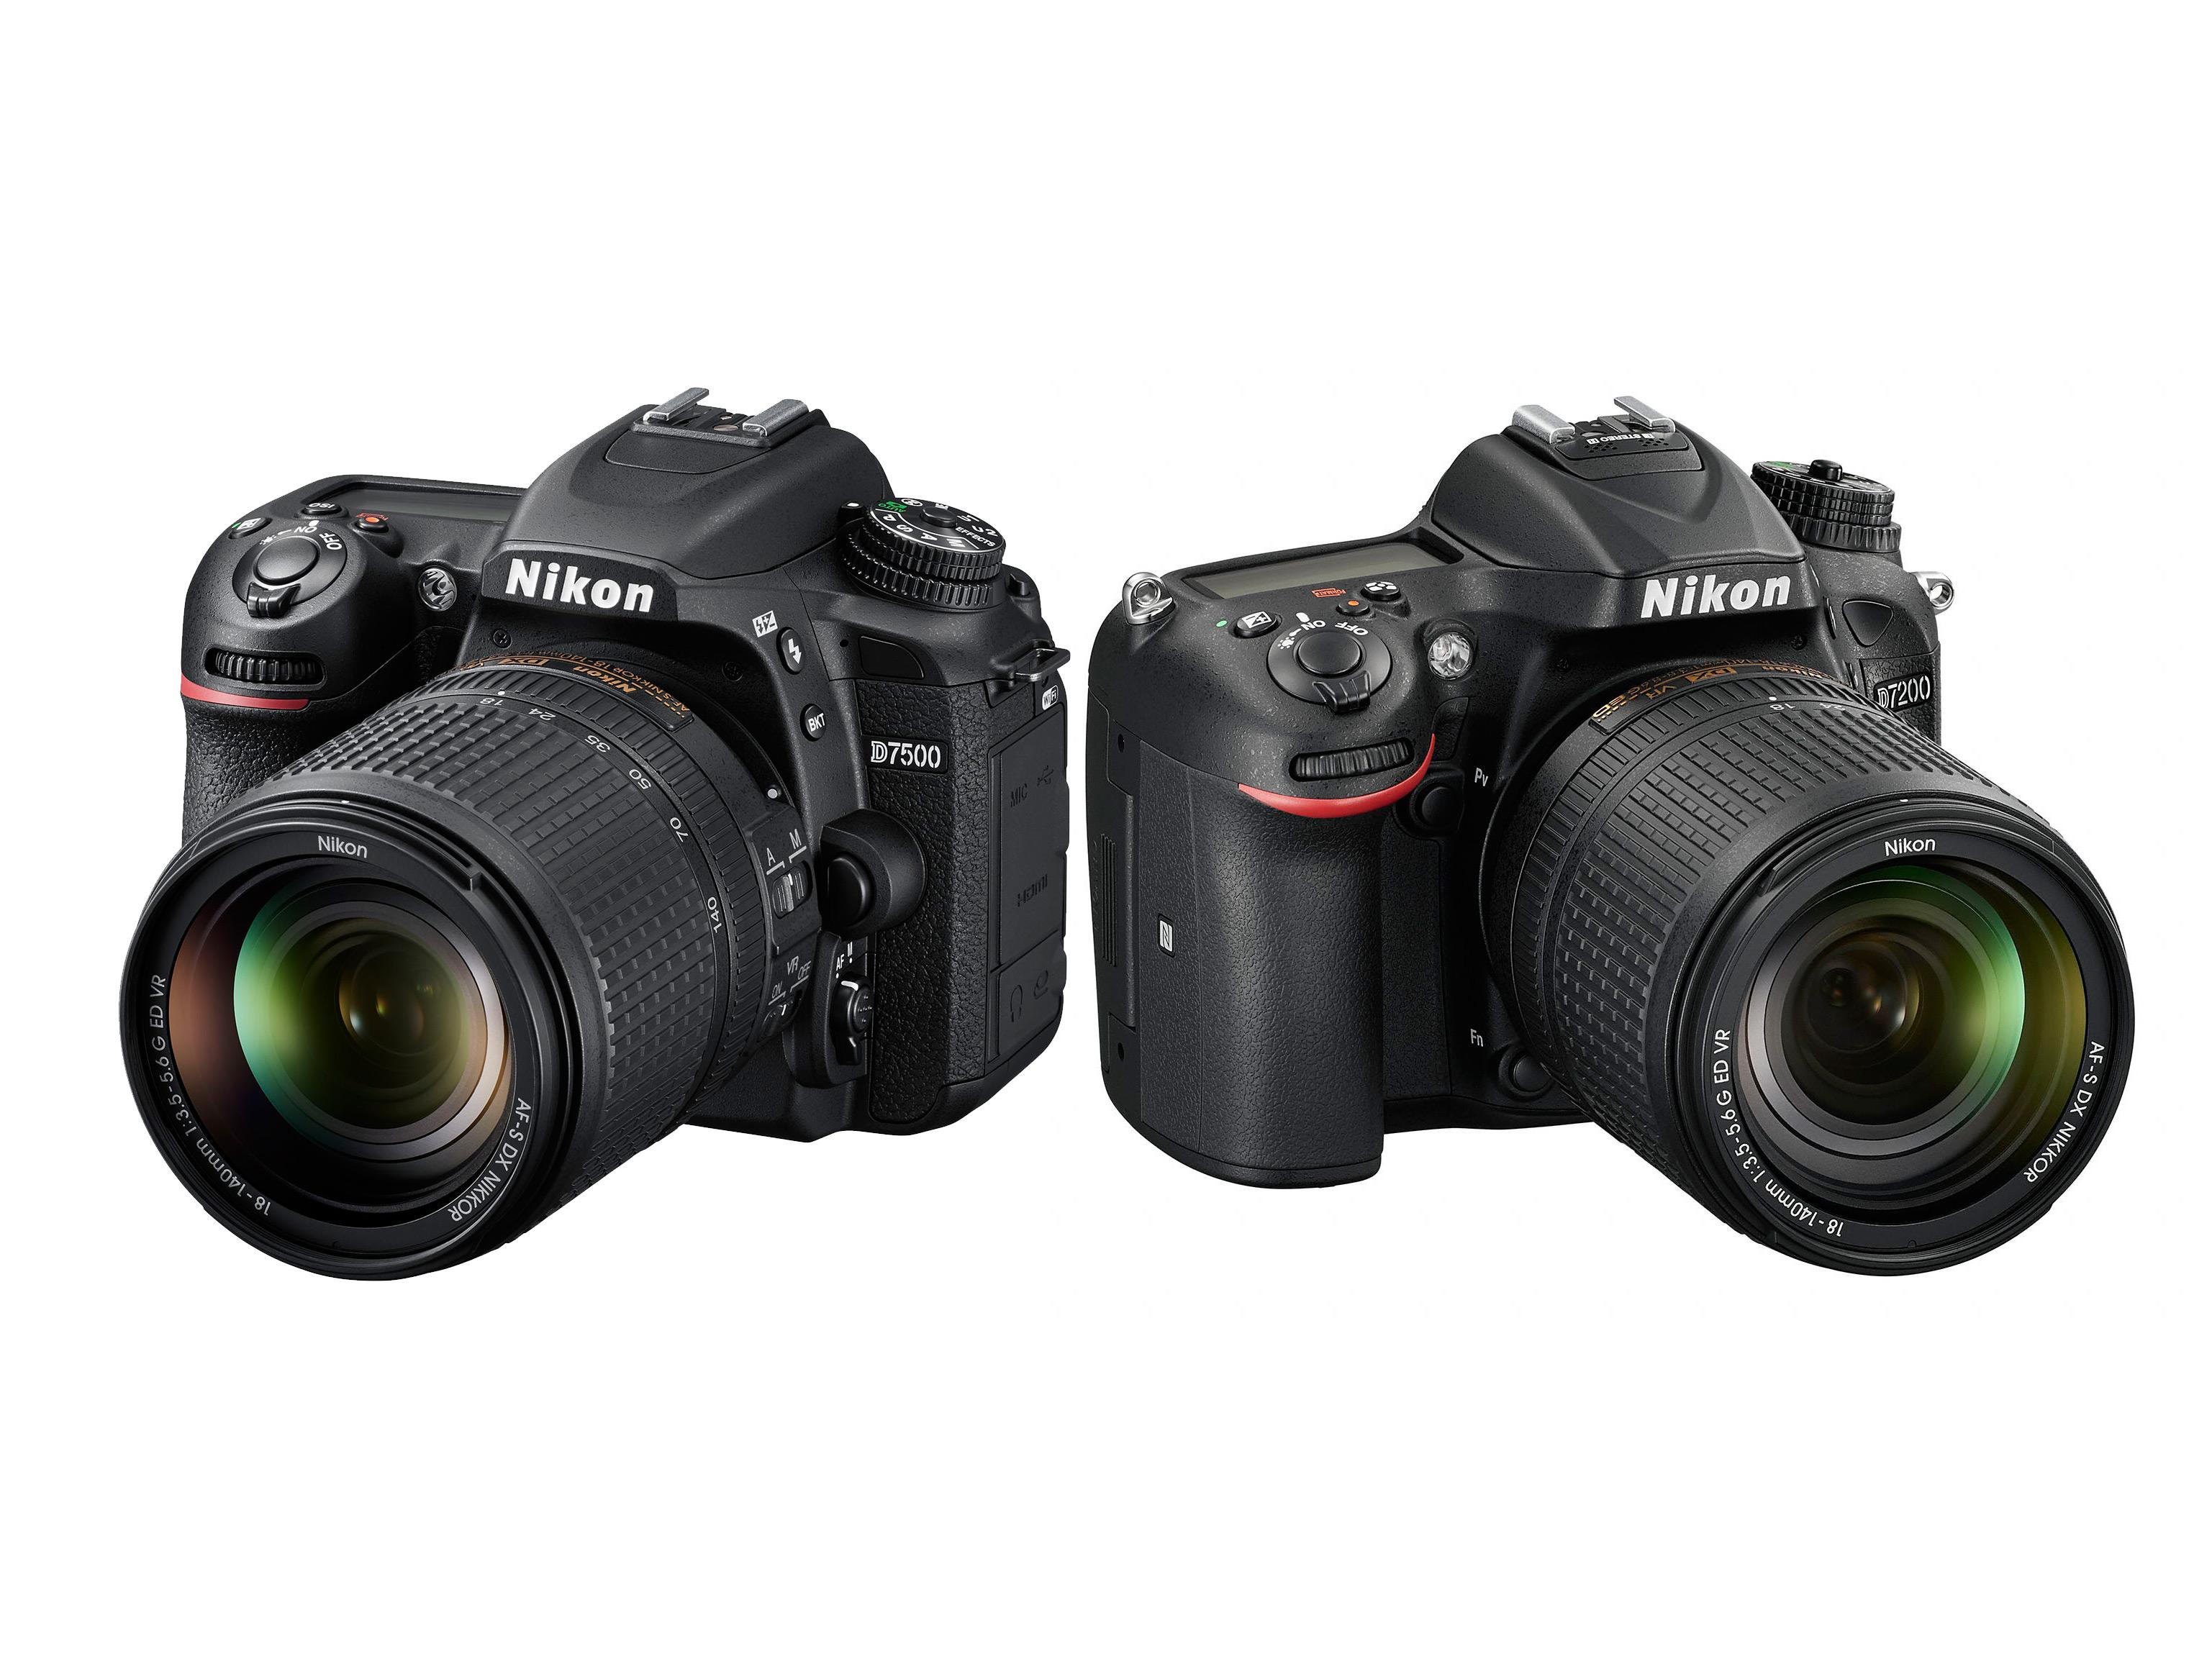 Nikon D7200 Review Digital Photography Review